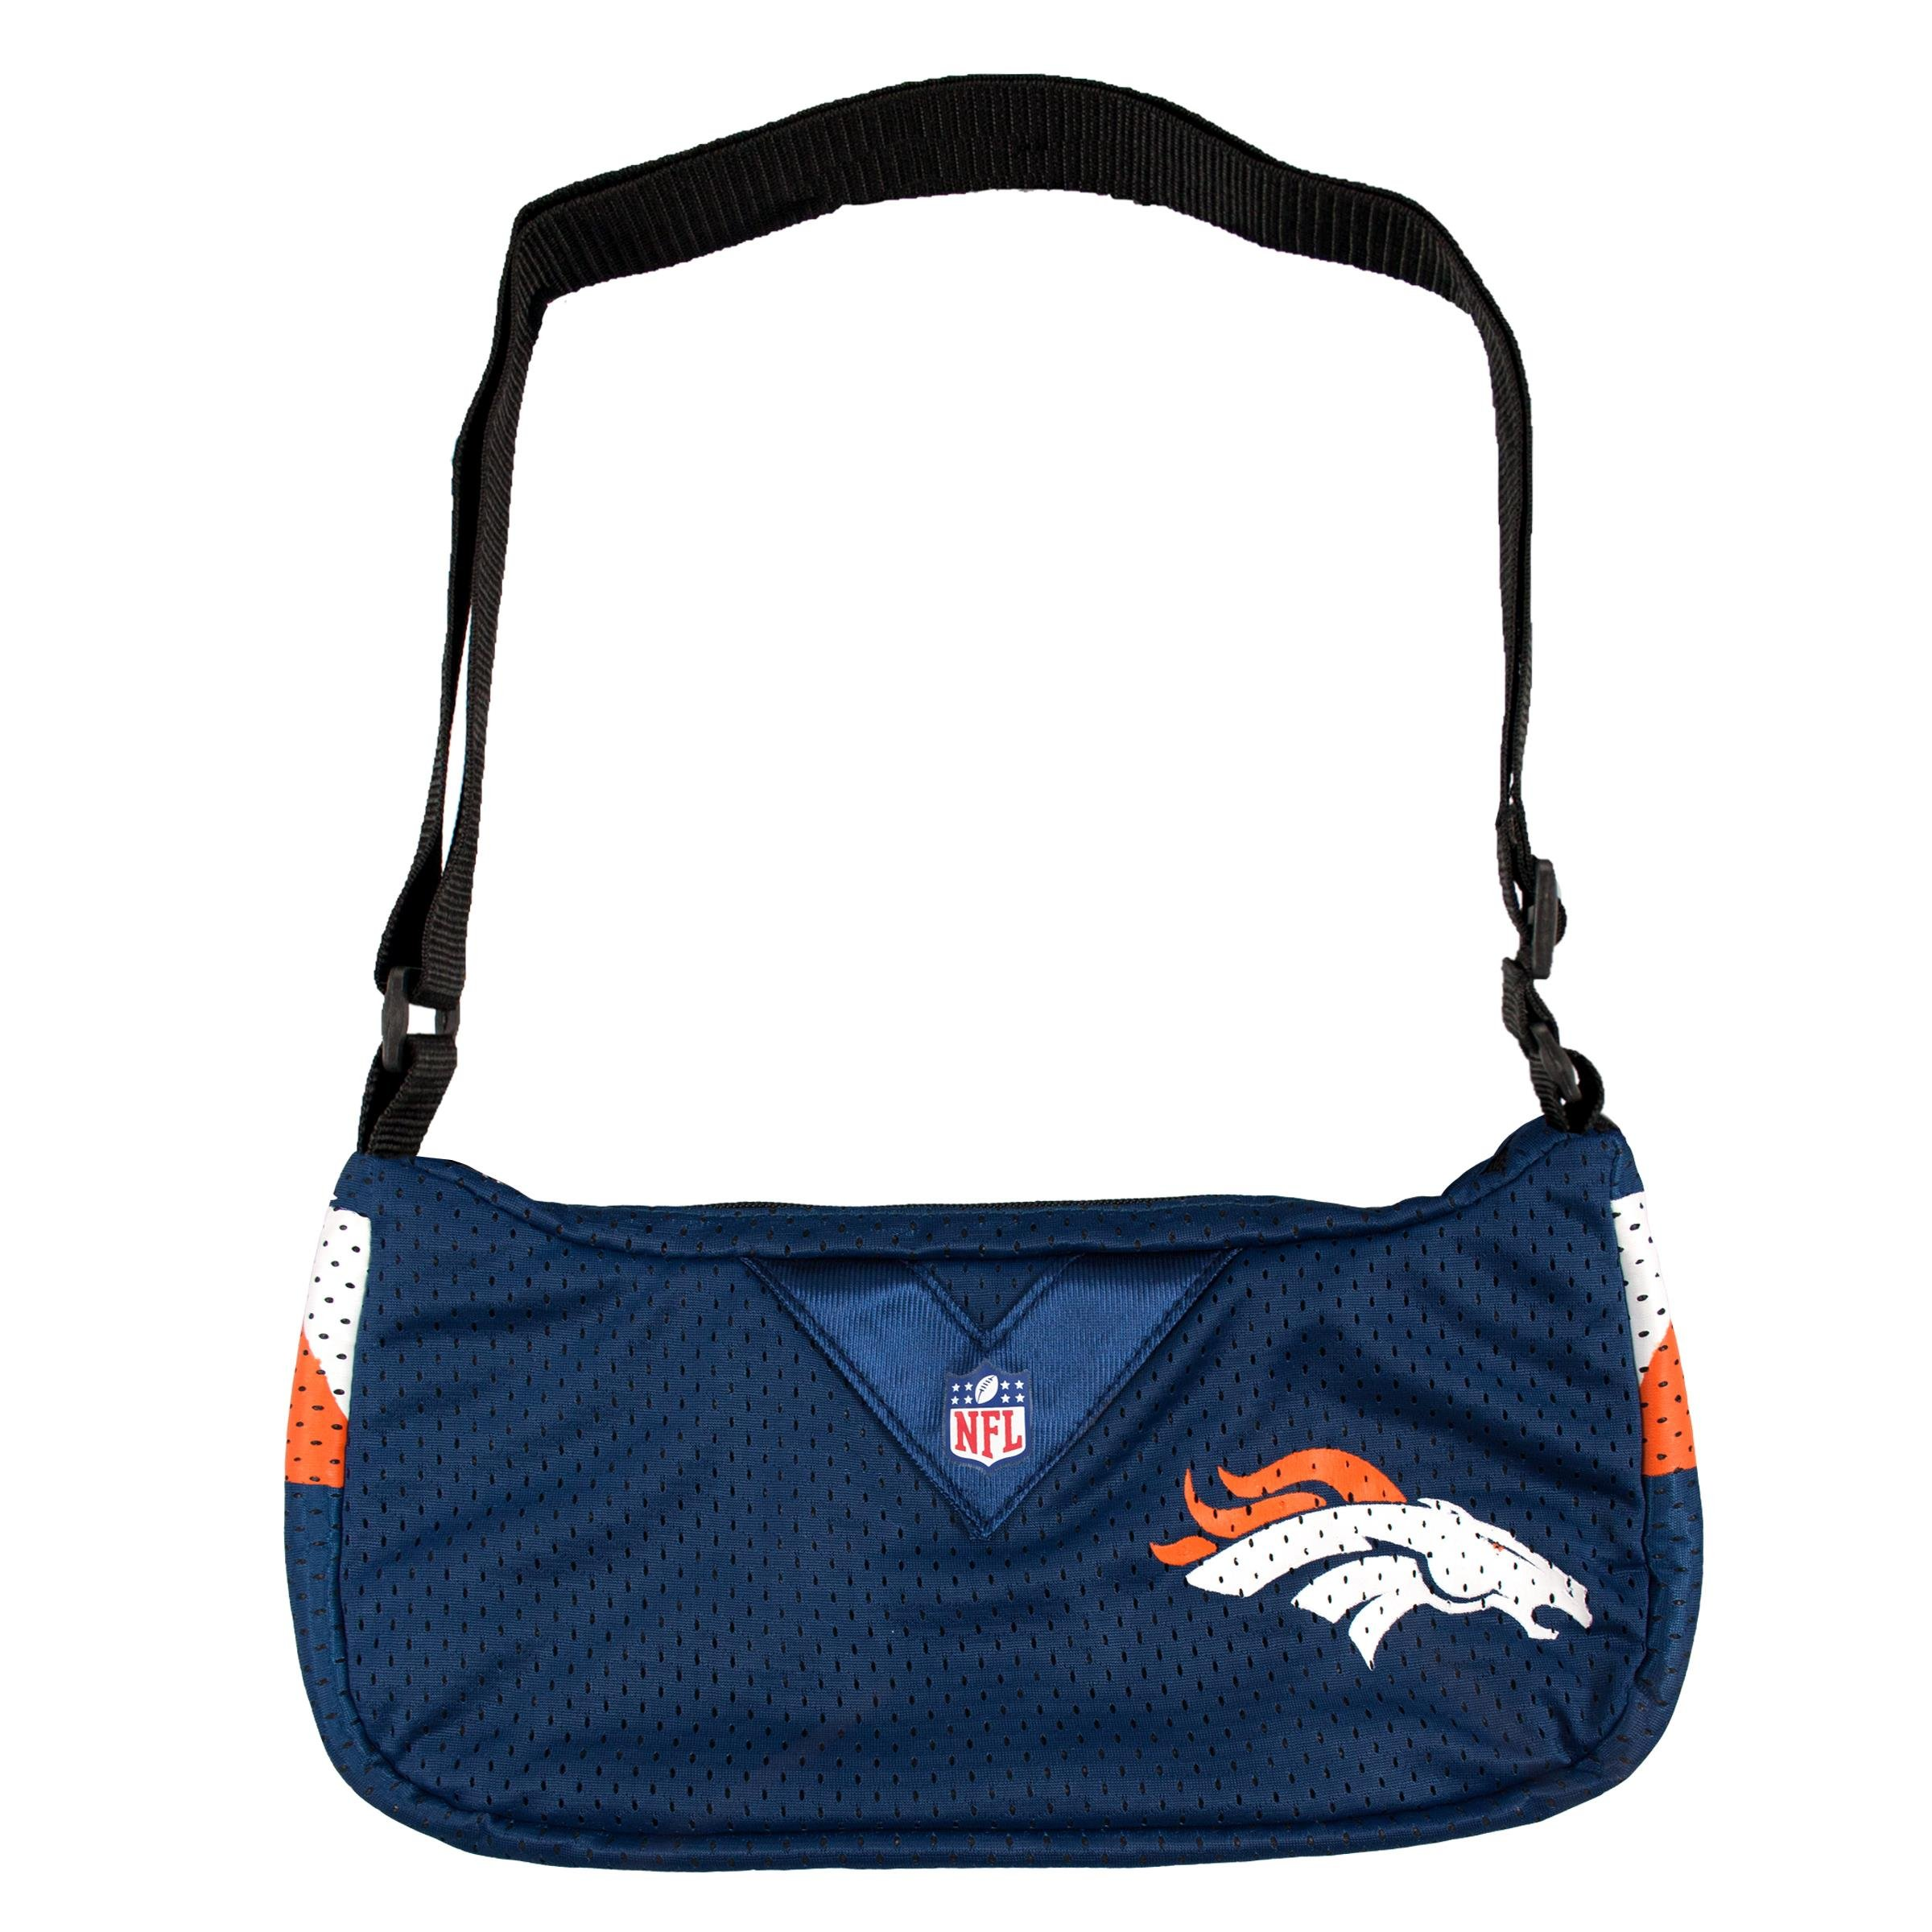 NFL Denver Broncos Jersey Team Purse